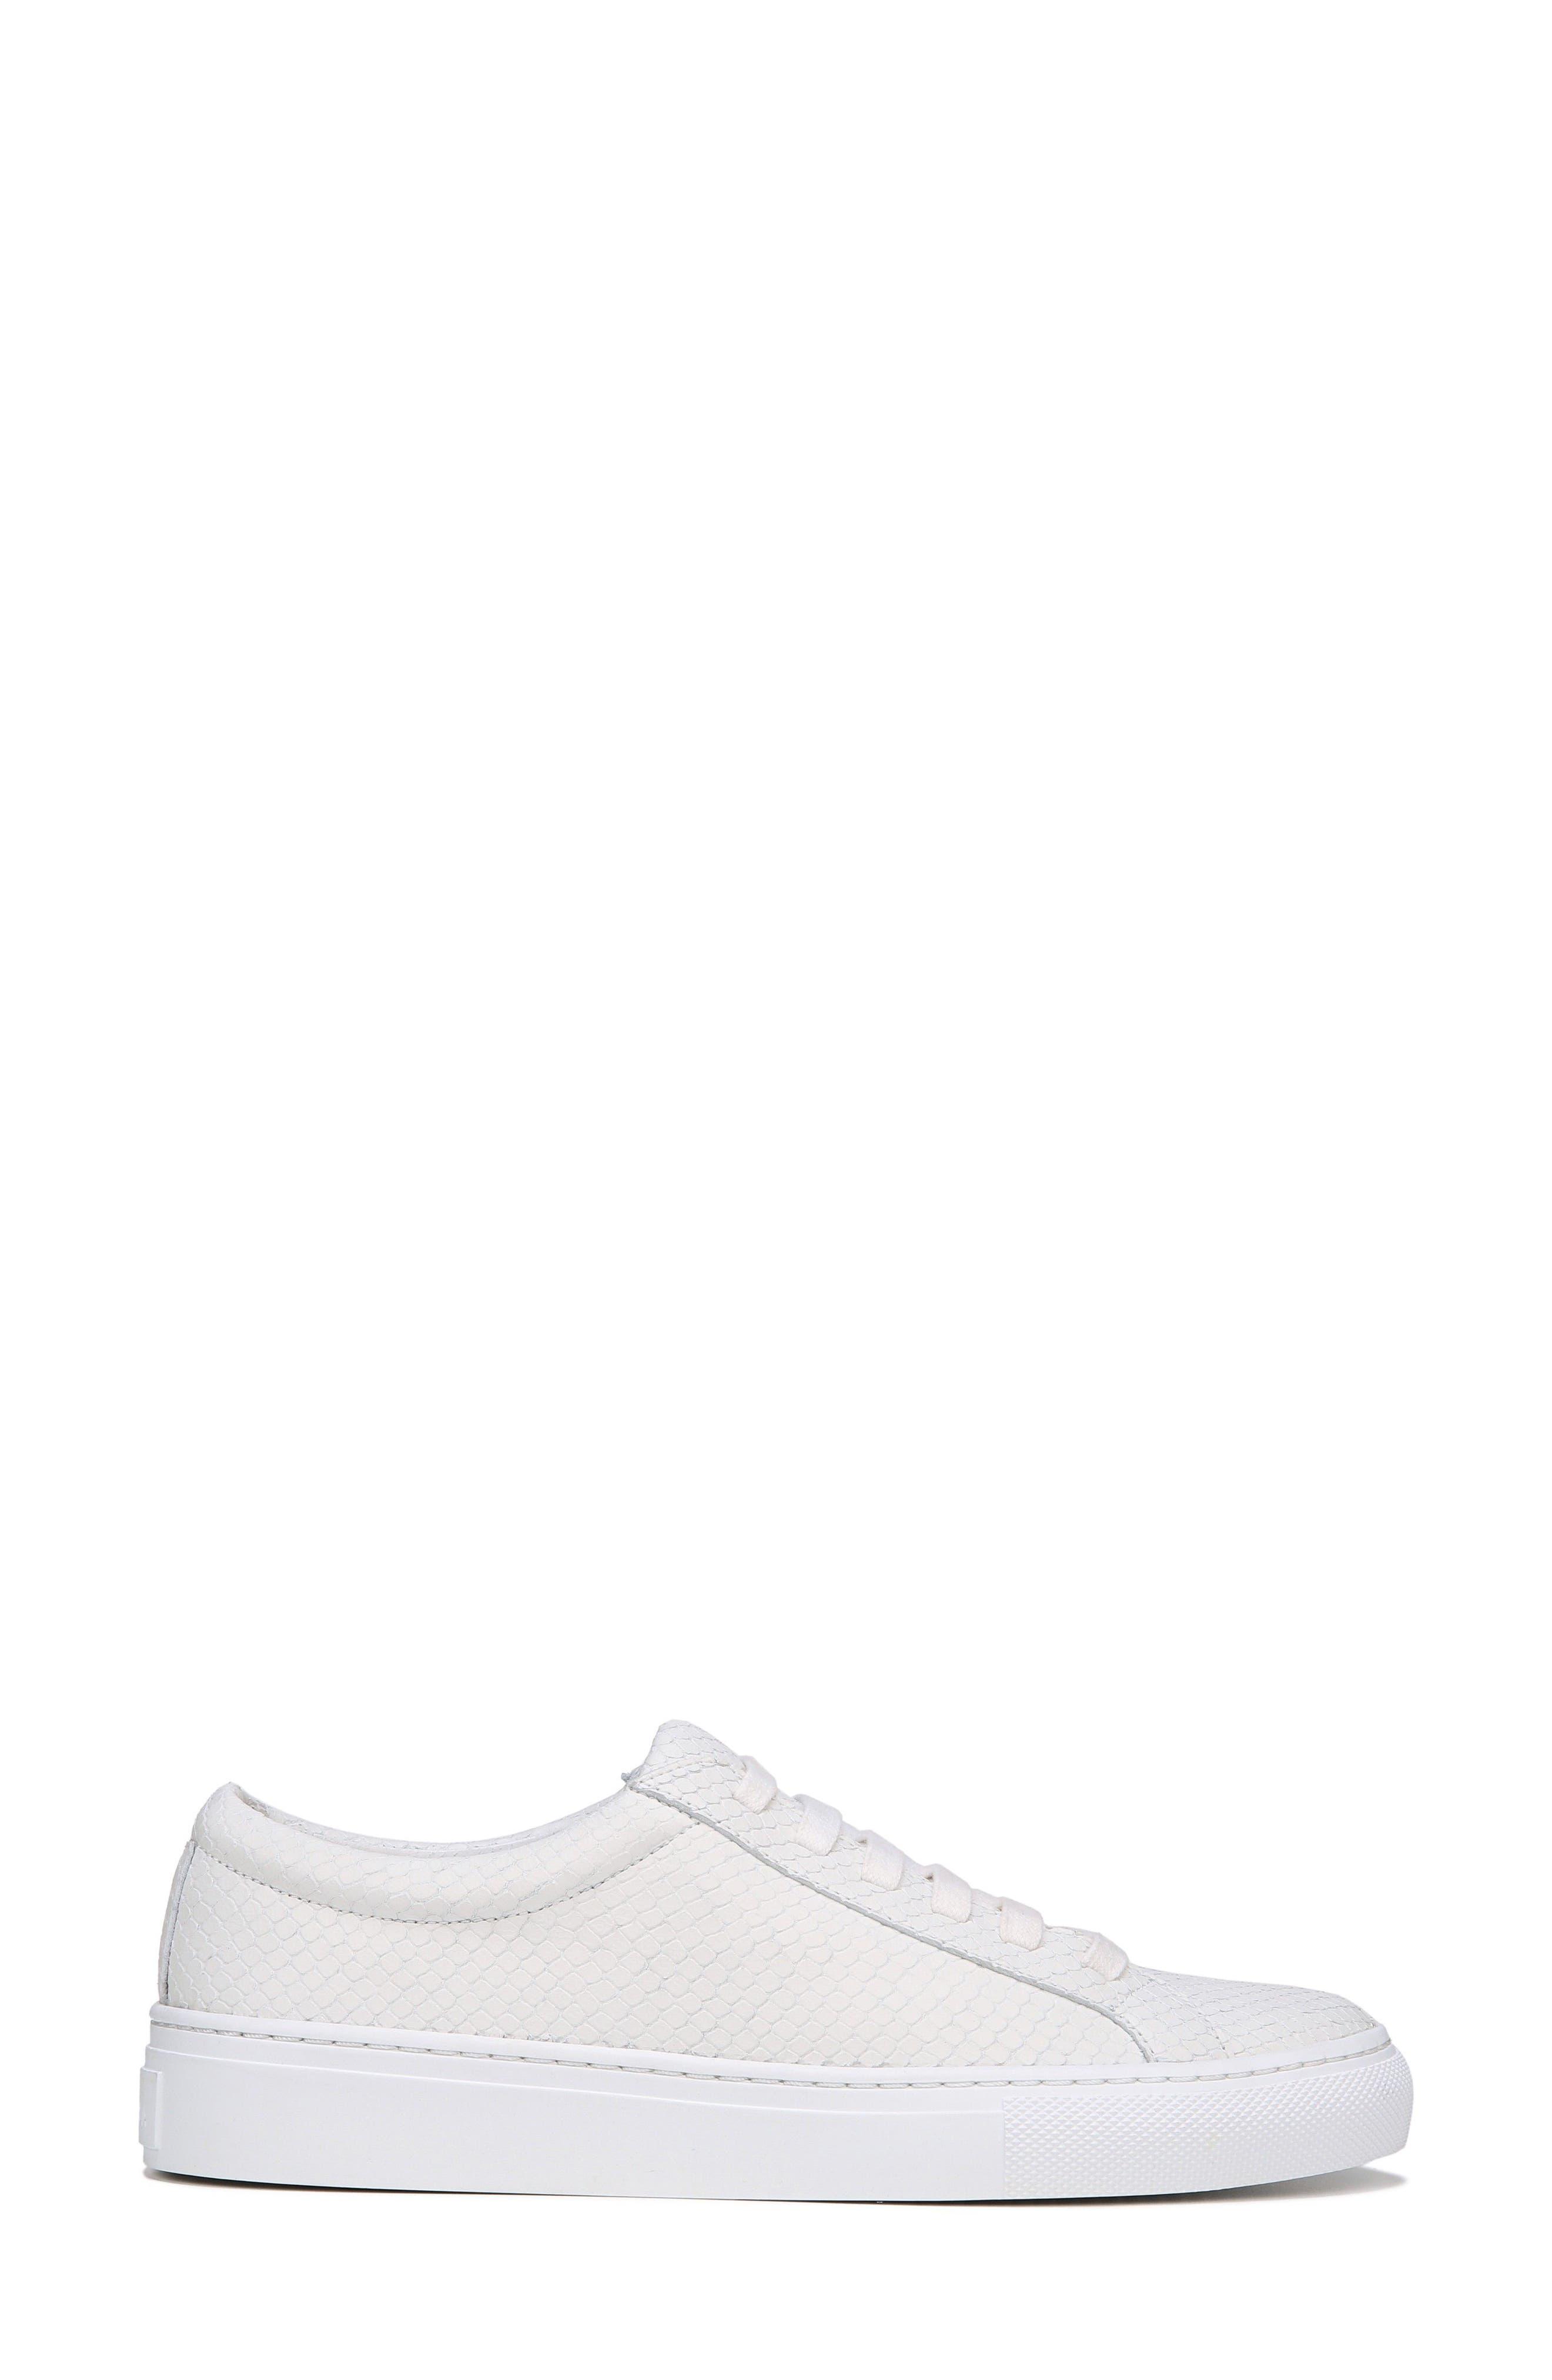 SUIV2 Snake Embossed Sneaker,                             Alternate thumbnail 3, color,                             Porcelain Leather